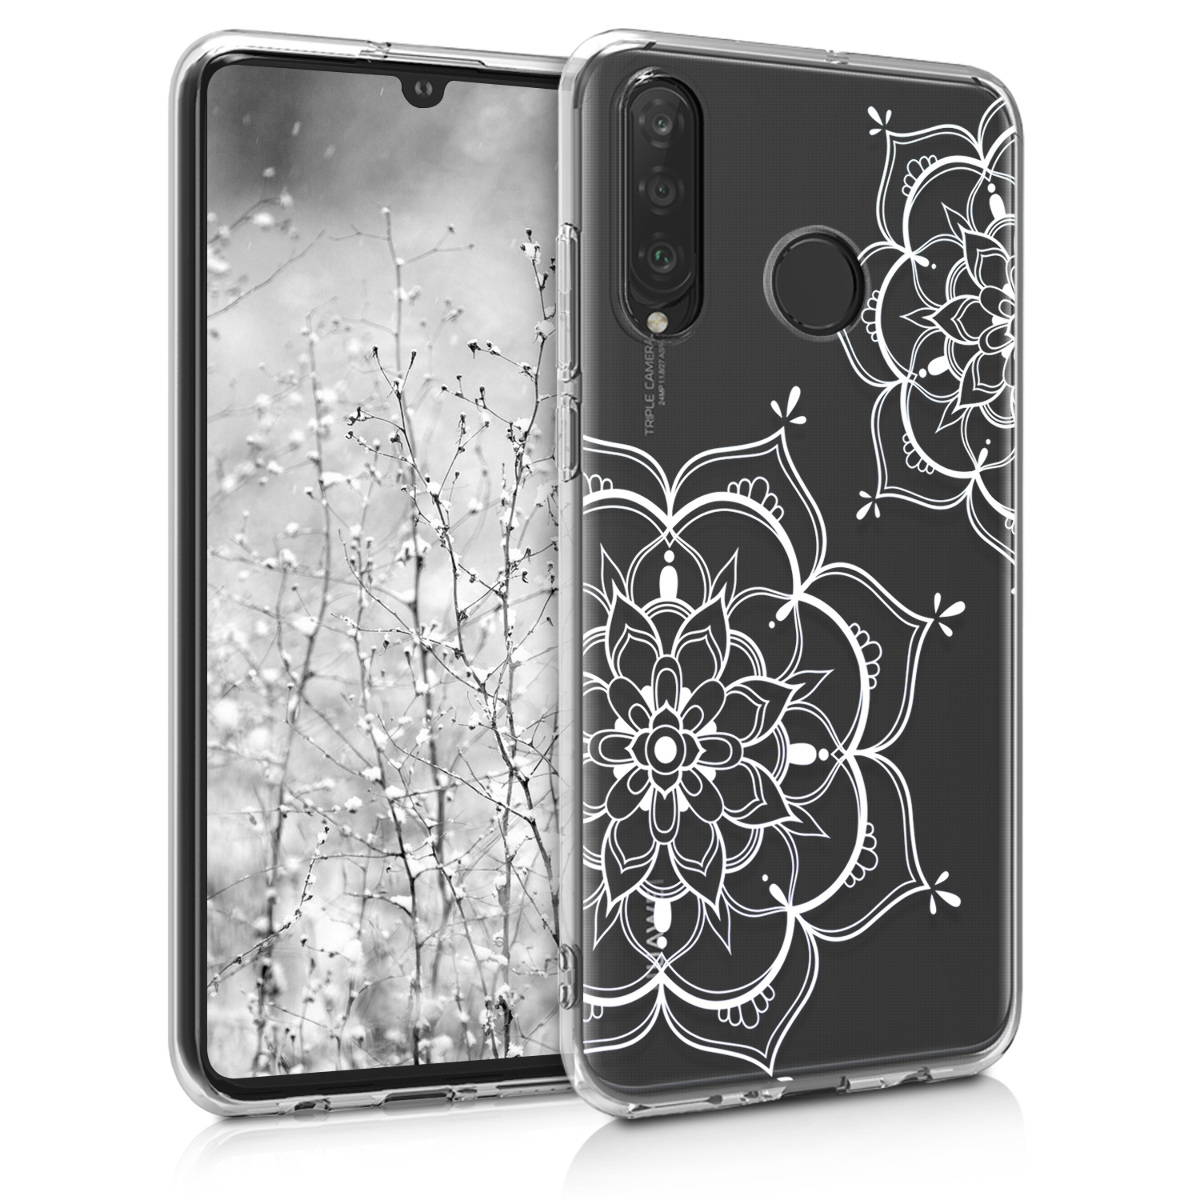 KW Θήκη Σιλικόνης Huawei P30 Lite - Silver / Transparent (47501.14)